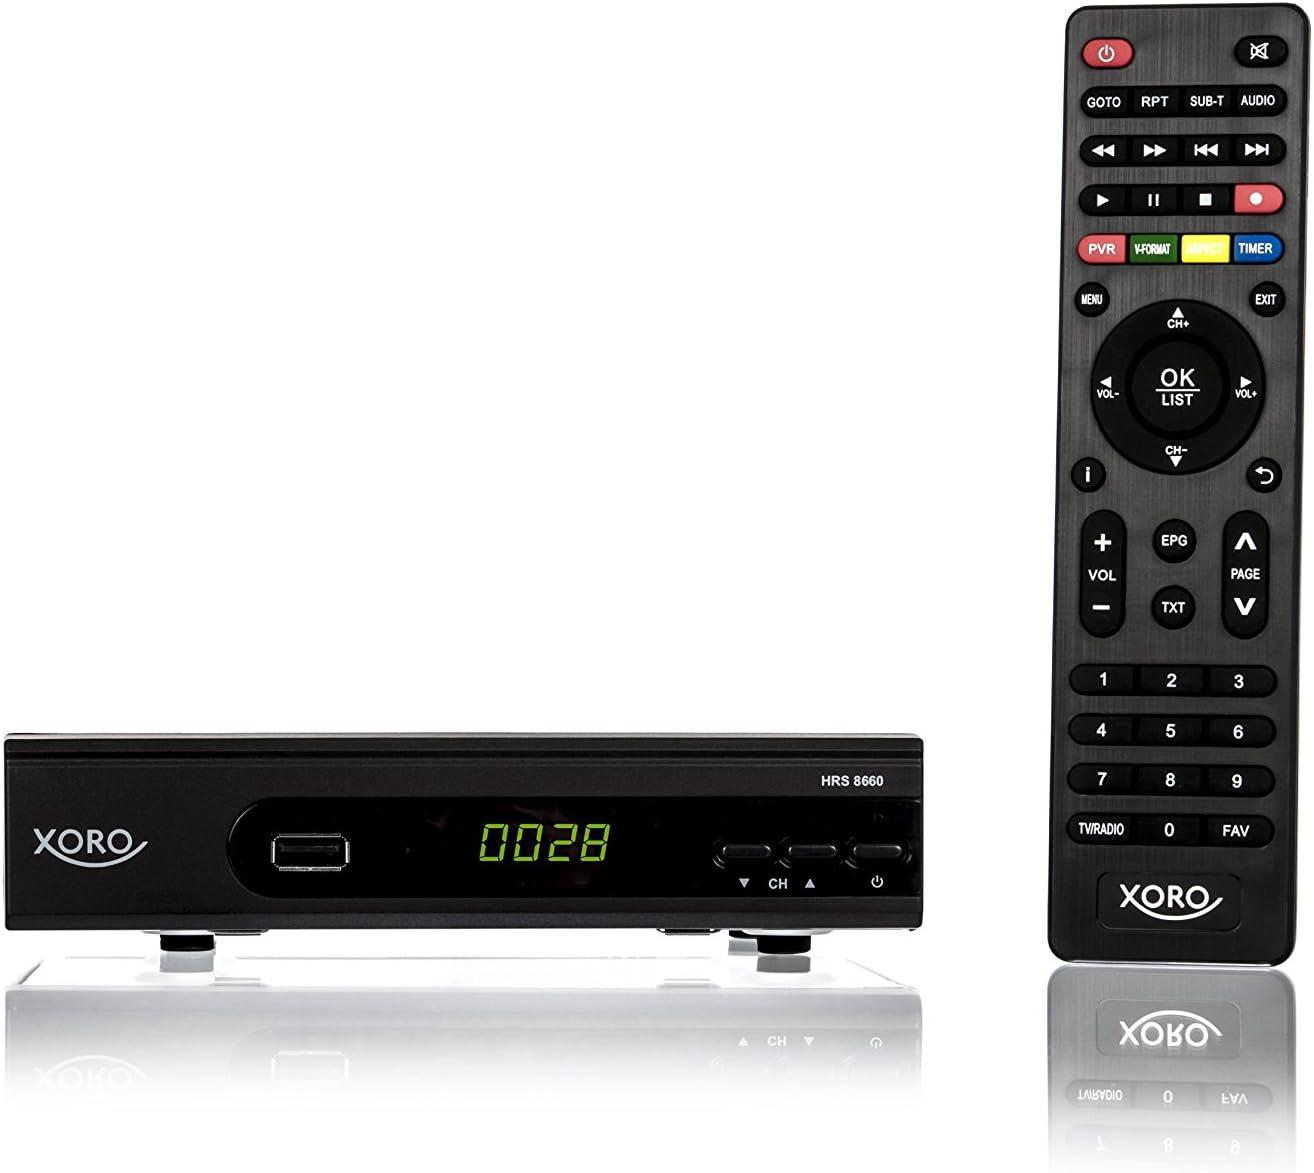 LAN Mas /électronique hrs 8660/Smart Xoro DVB-S2/r/écepteur Alexa Noir MMP USB PVR Ready